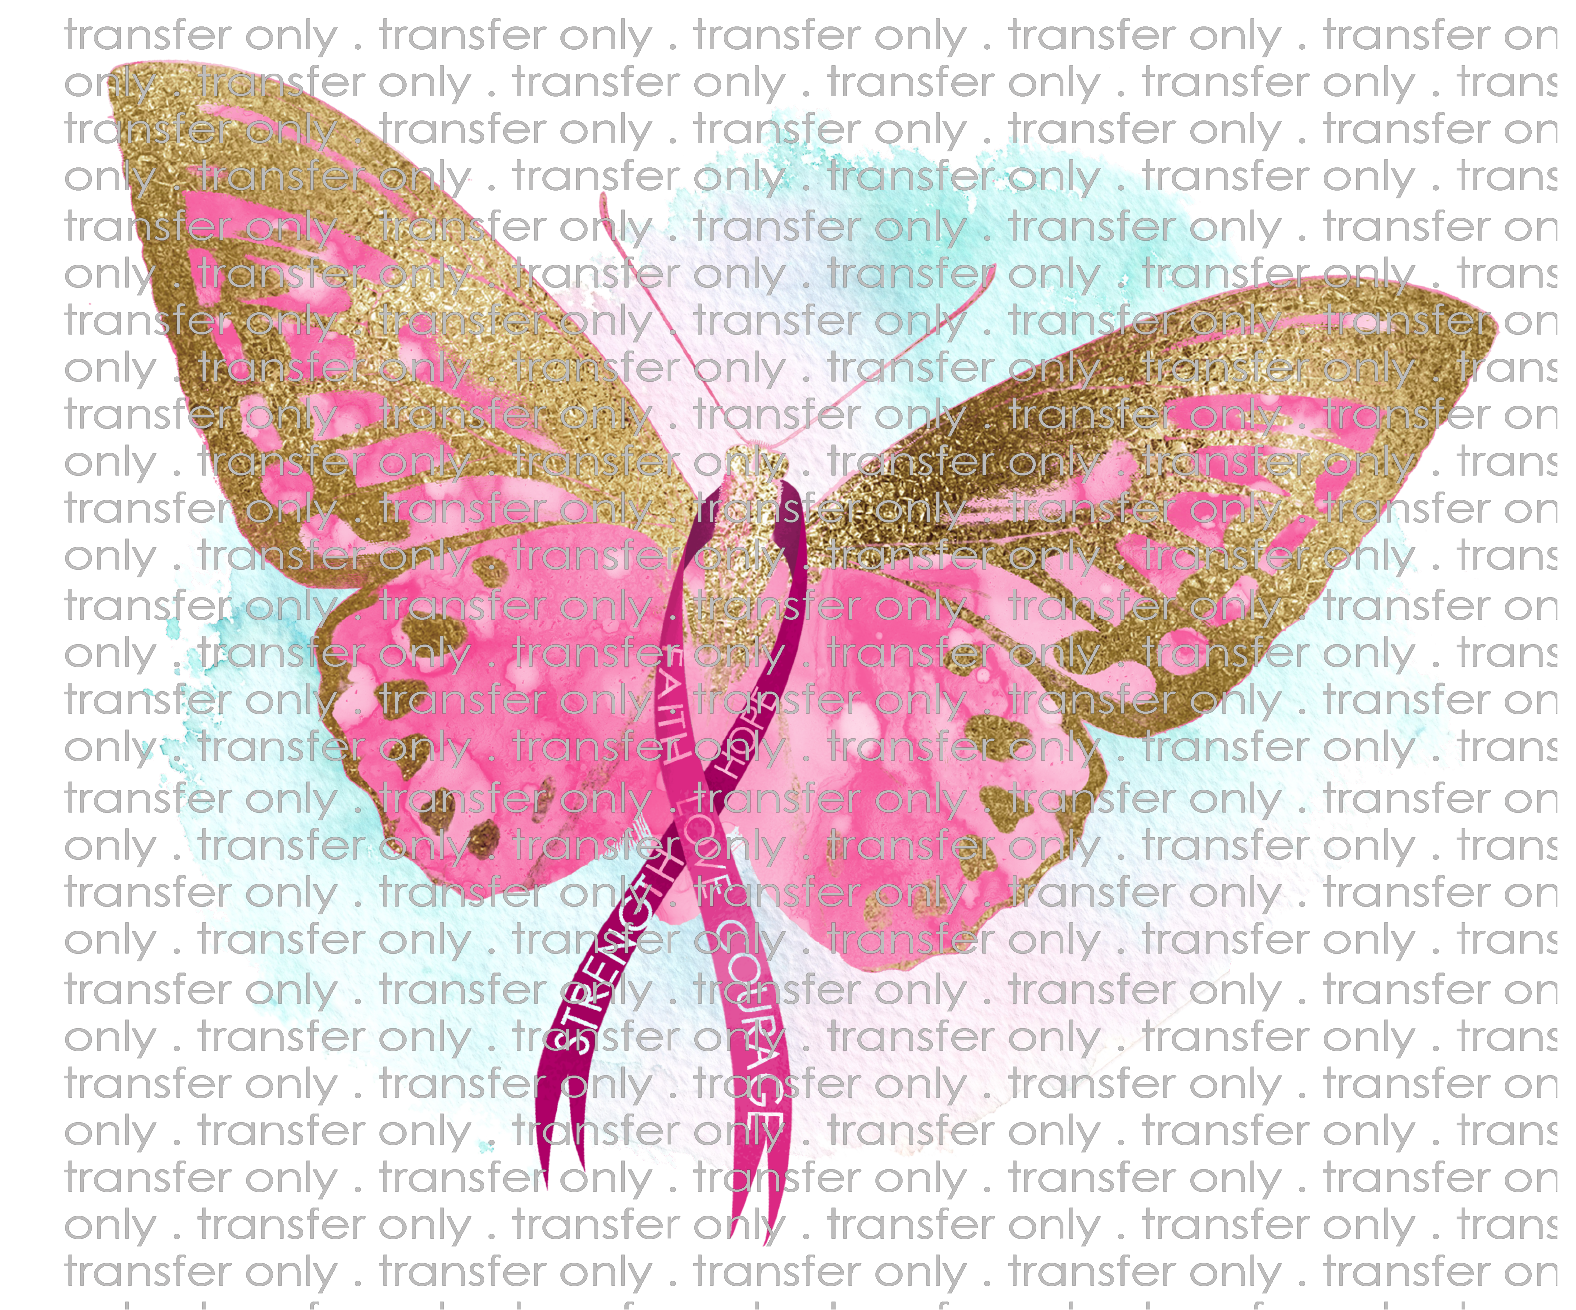 Siser Awr14 Breast Cancer Awareness Butterfly Taylored Vinyl